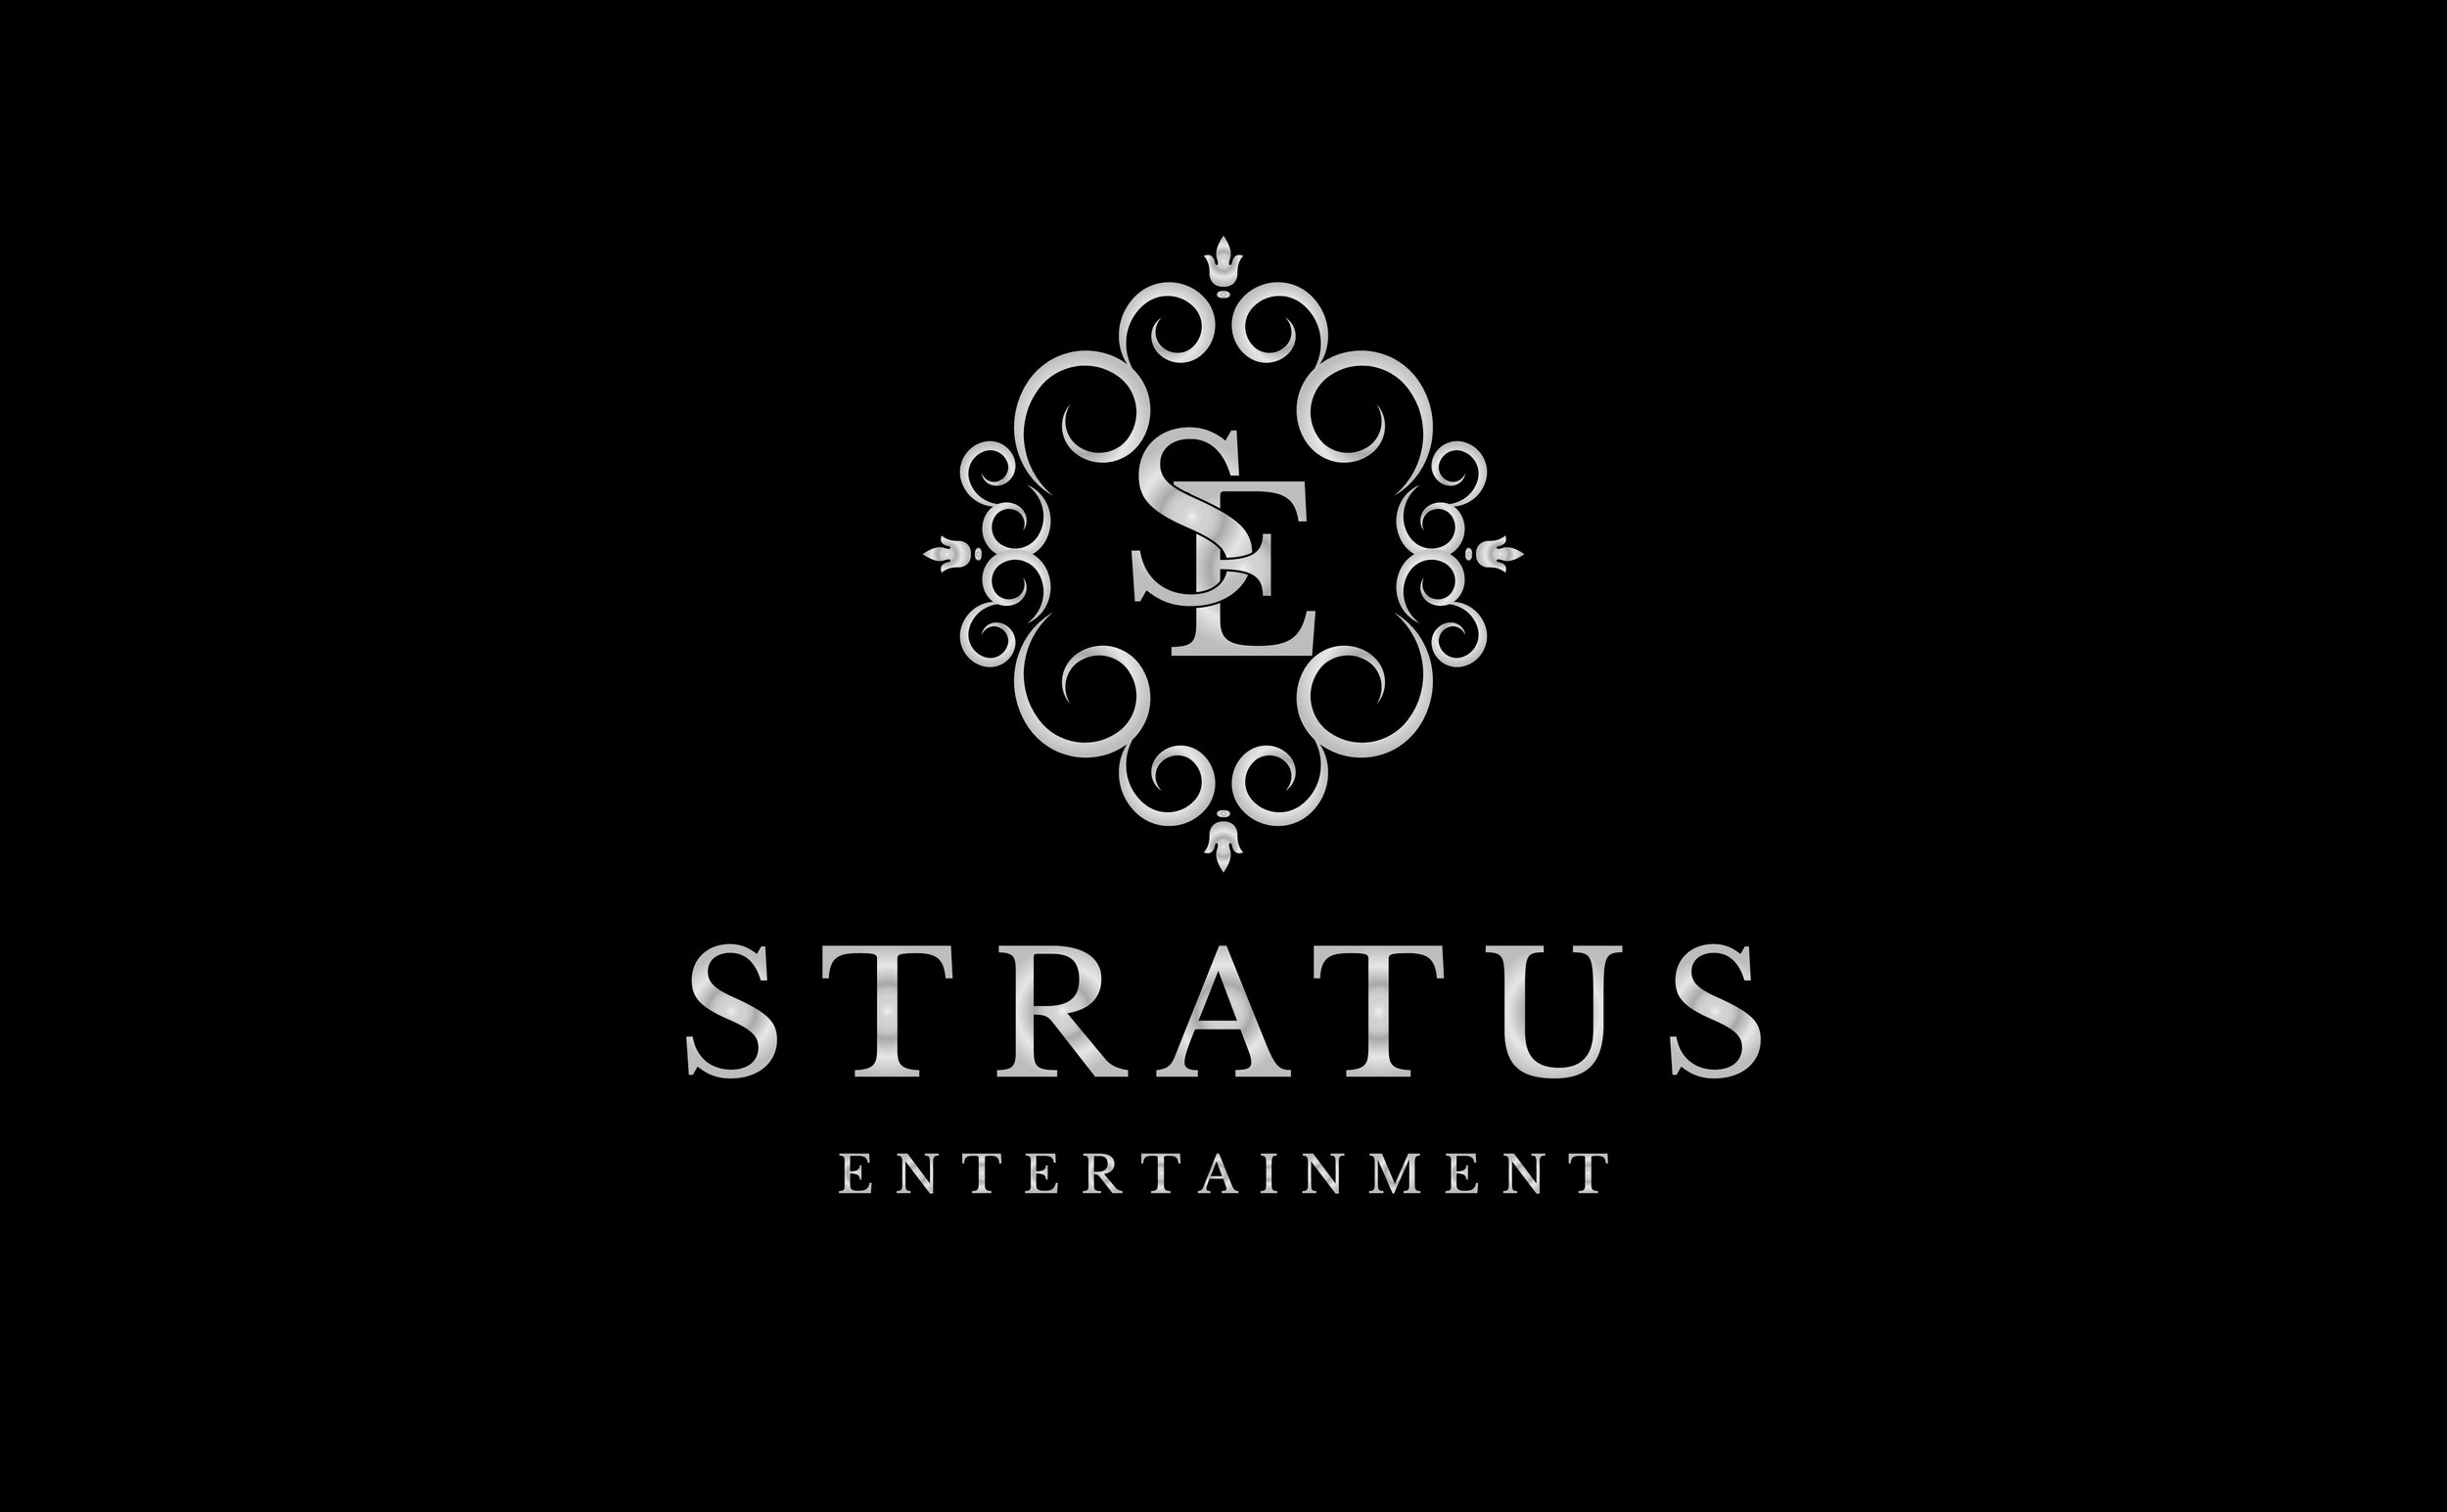 Stratus_Entertainment01.jpg